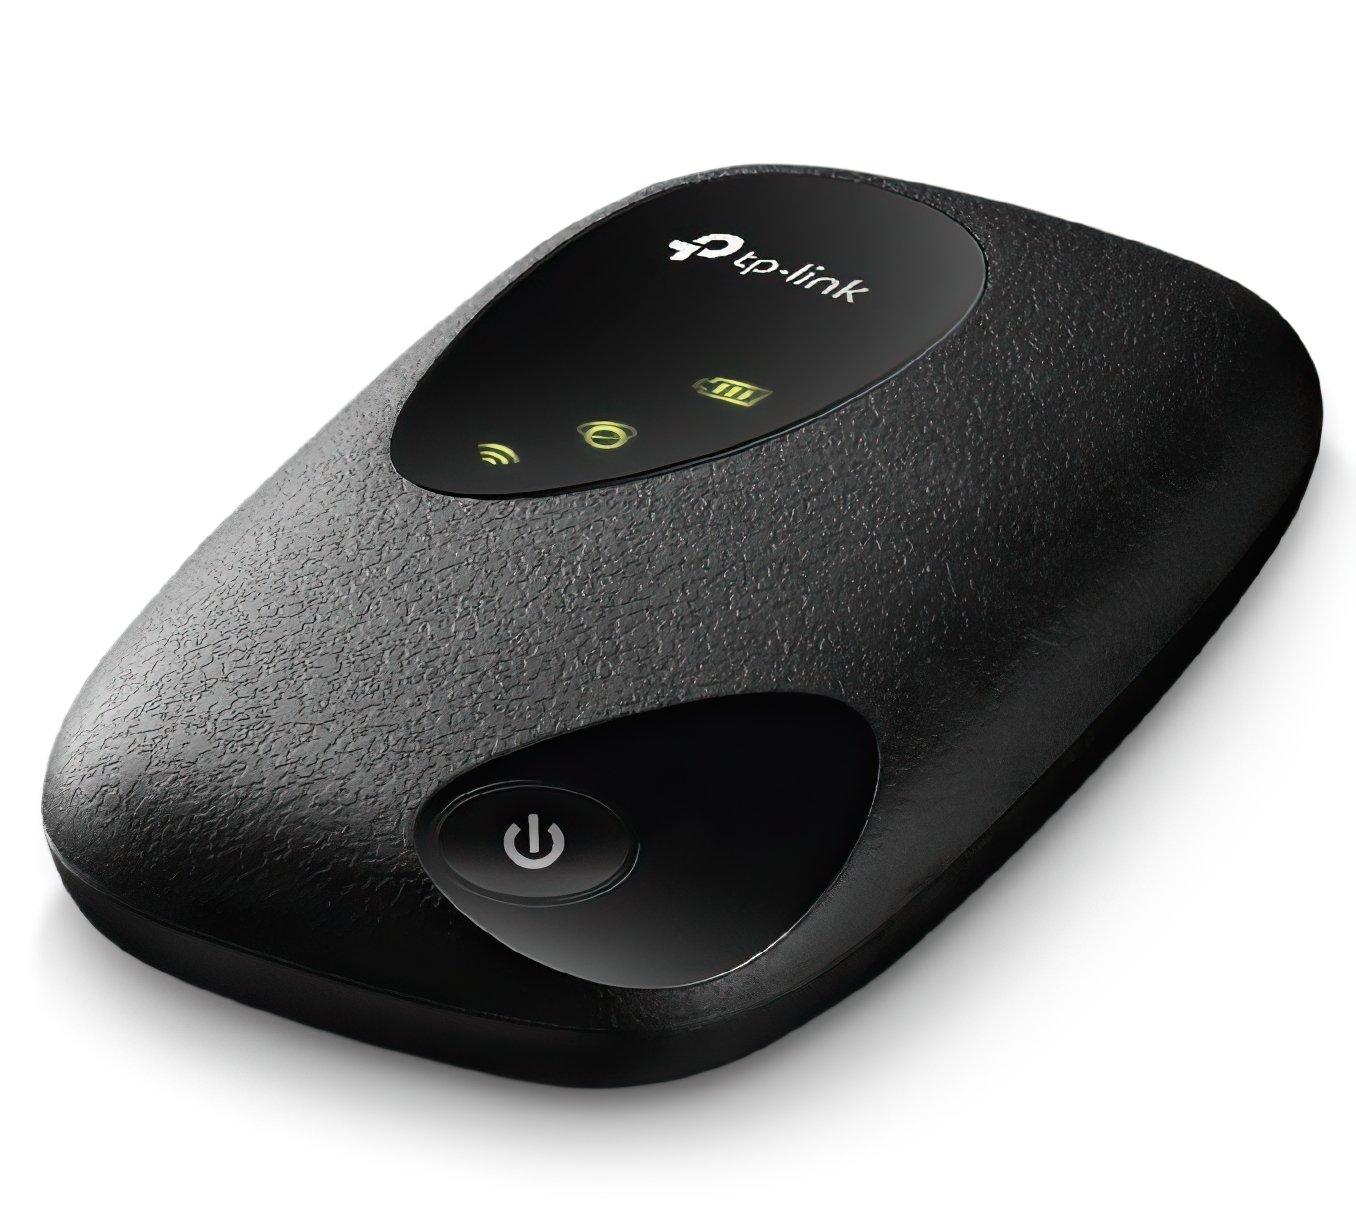 Роутер TP-Link M7200 LTE-Advanced Wi-Fi Black фото